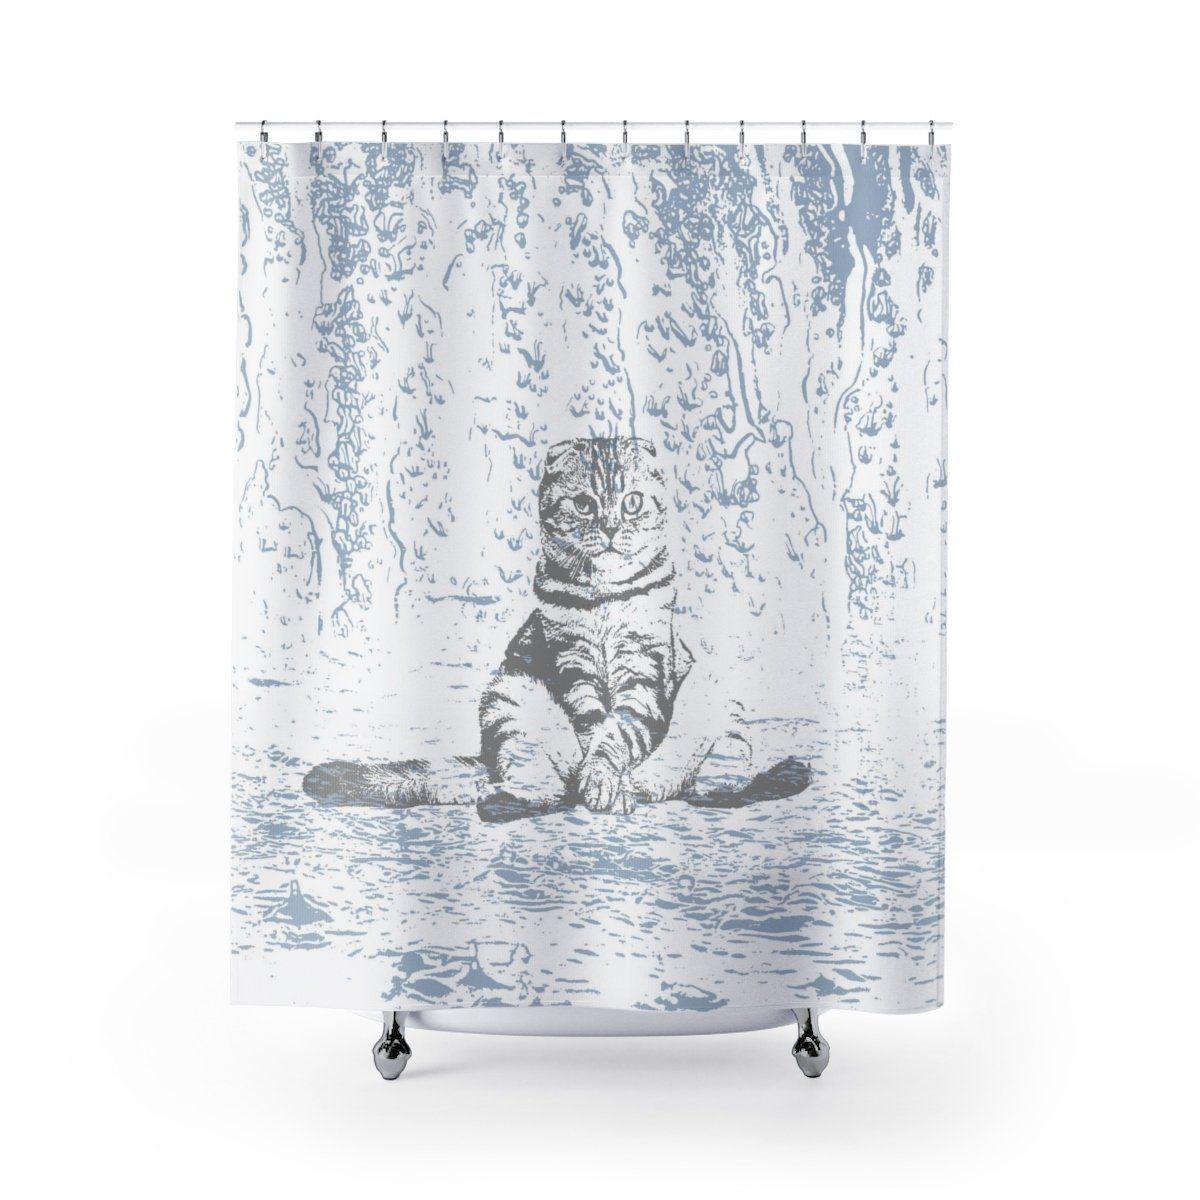 Grumpy Wet Cat Shower Curtain Cat Shower Curtain Funny Shower